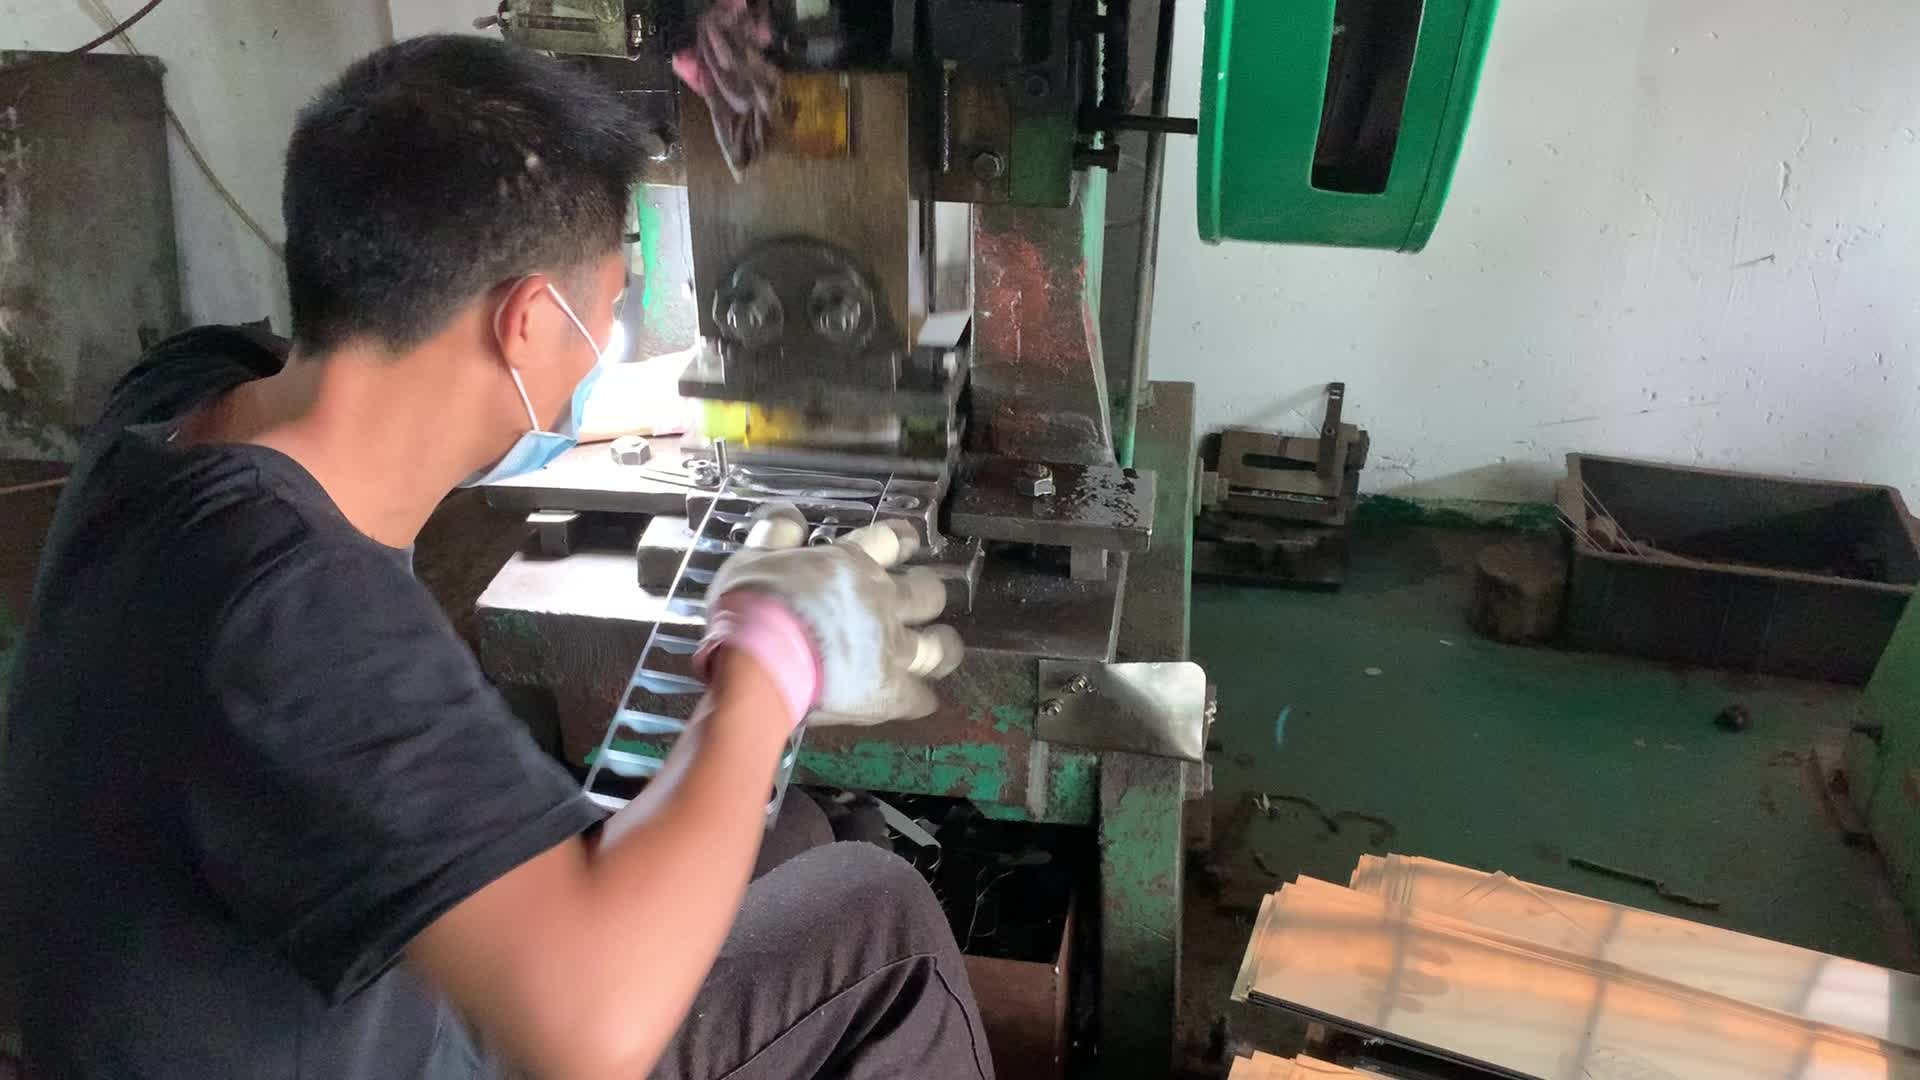 Master Profesional V Sharped Ujung Stainless Steel Pisau DIN 1.4110 Pisau Daging Skin Pisau Cuchillo Despellejar